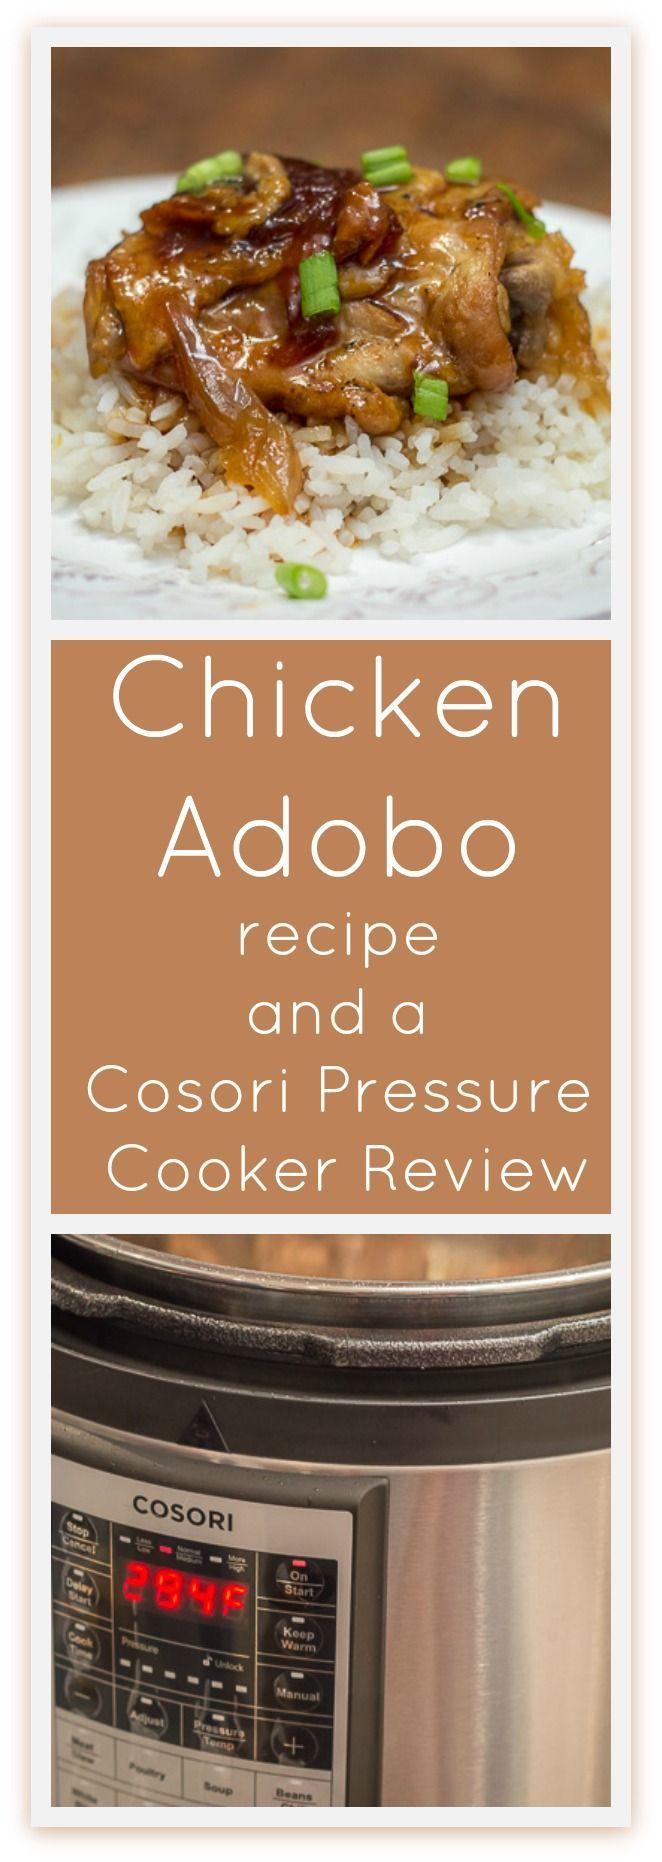 A review of the 6 Quart Premium Cosori Pressure Cooker, and a delicious, easy, and quick recipe for Chicken Adobo in a pressure cooker, plus, a giveaway! #sponsored #pressurecooker #instantpotrecipe #filipinorecipe #filipinonationaldish #easyweeknightmeal